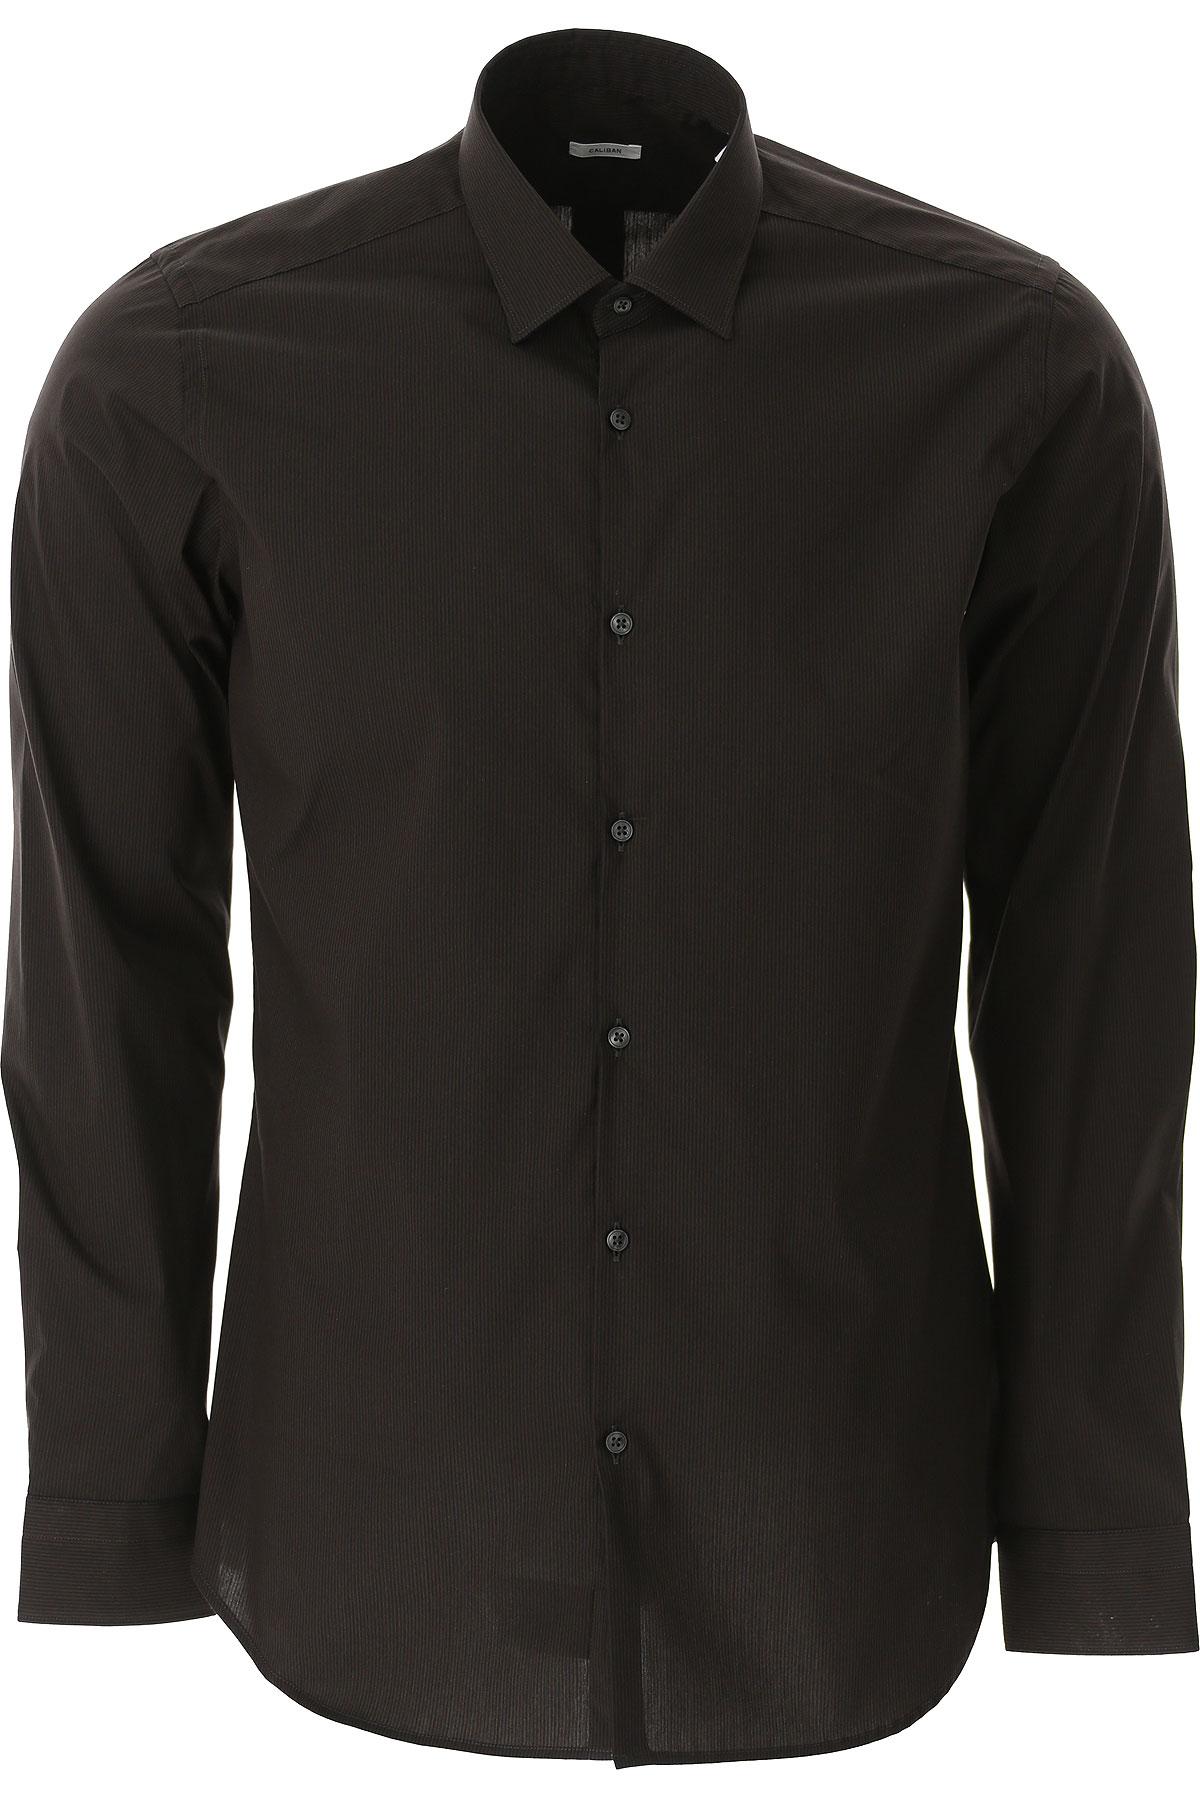 Caliban Shirt for Men On Sale, Black, Cotton, 2019, 15 15.75 16 17 17.5